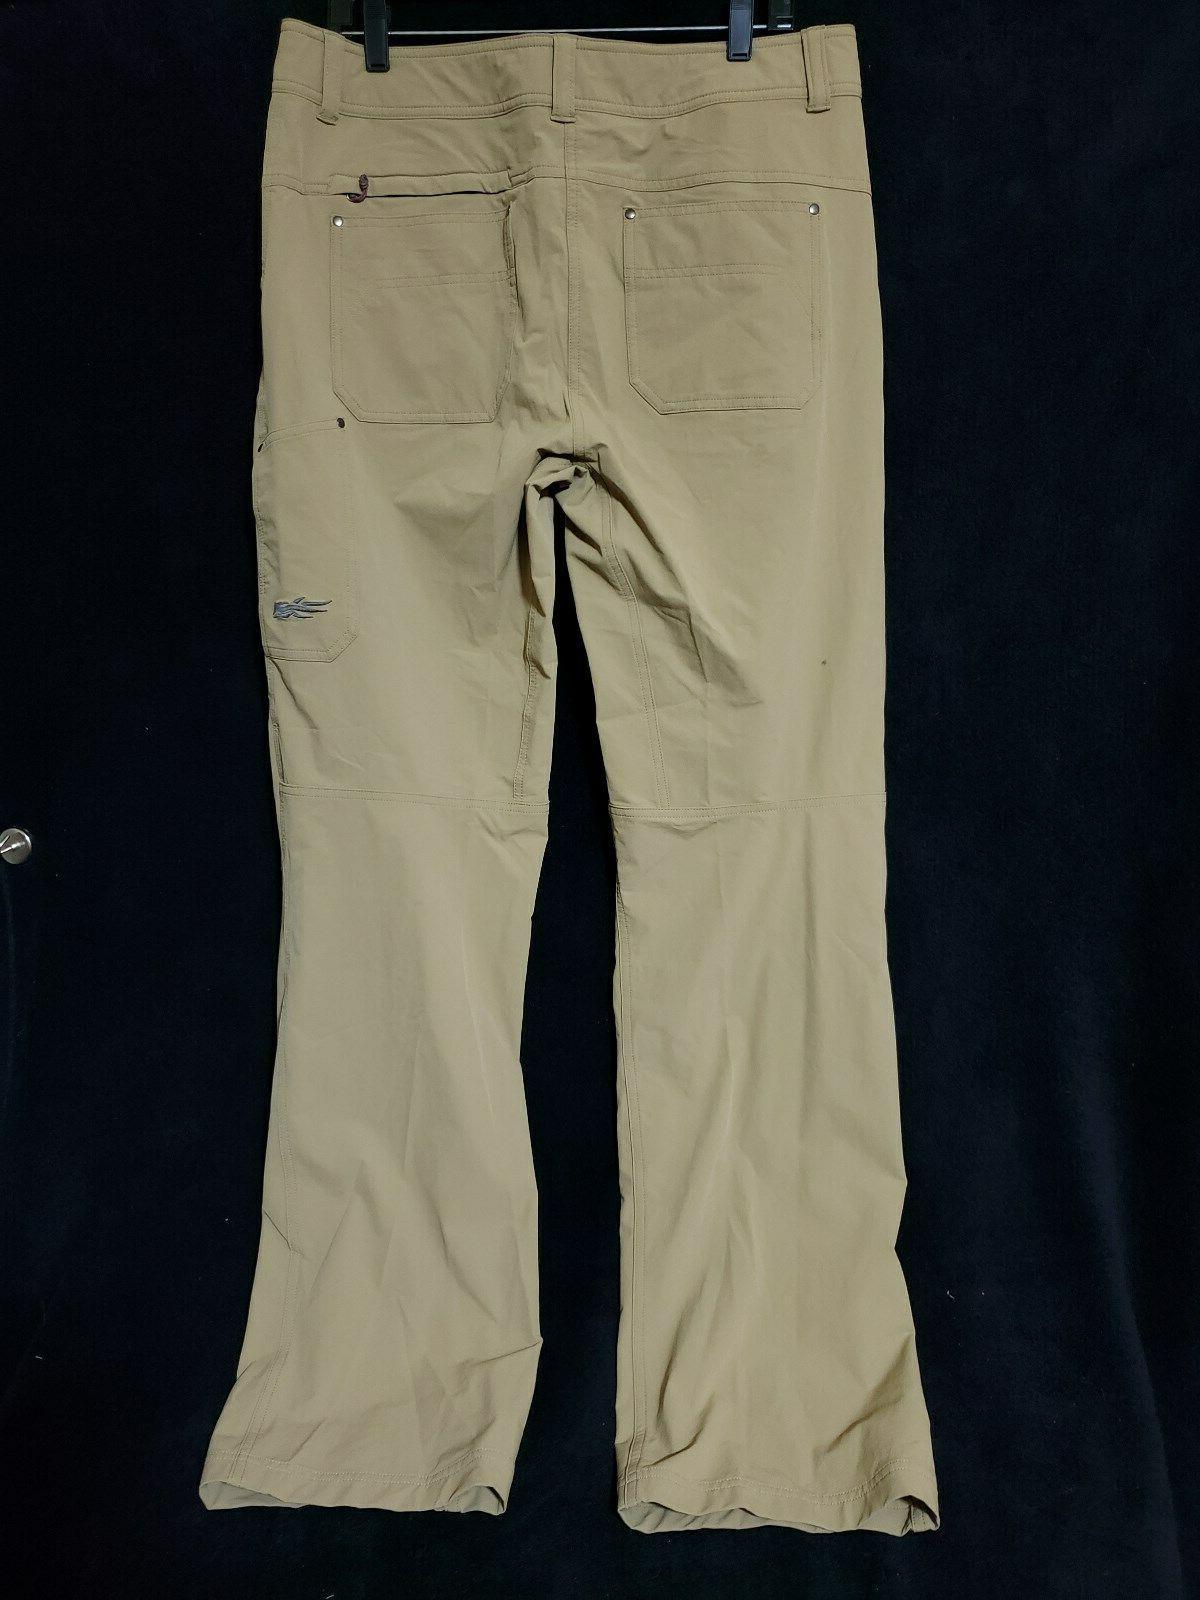 NWOT GEAR Men's Pants 36T